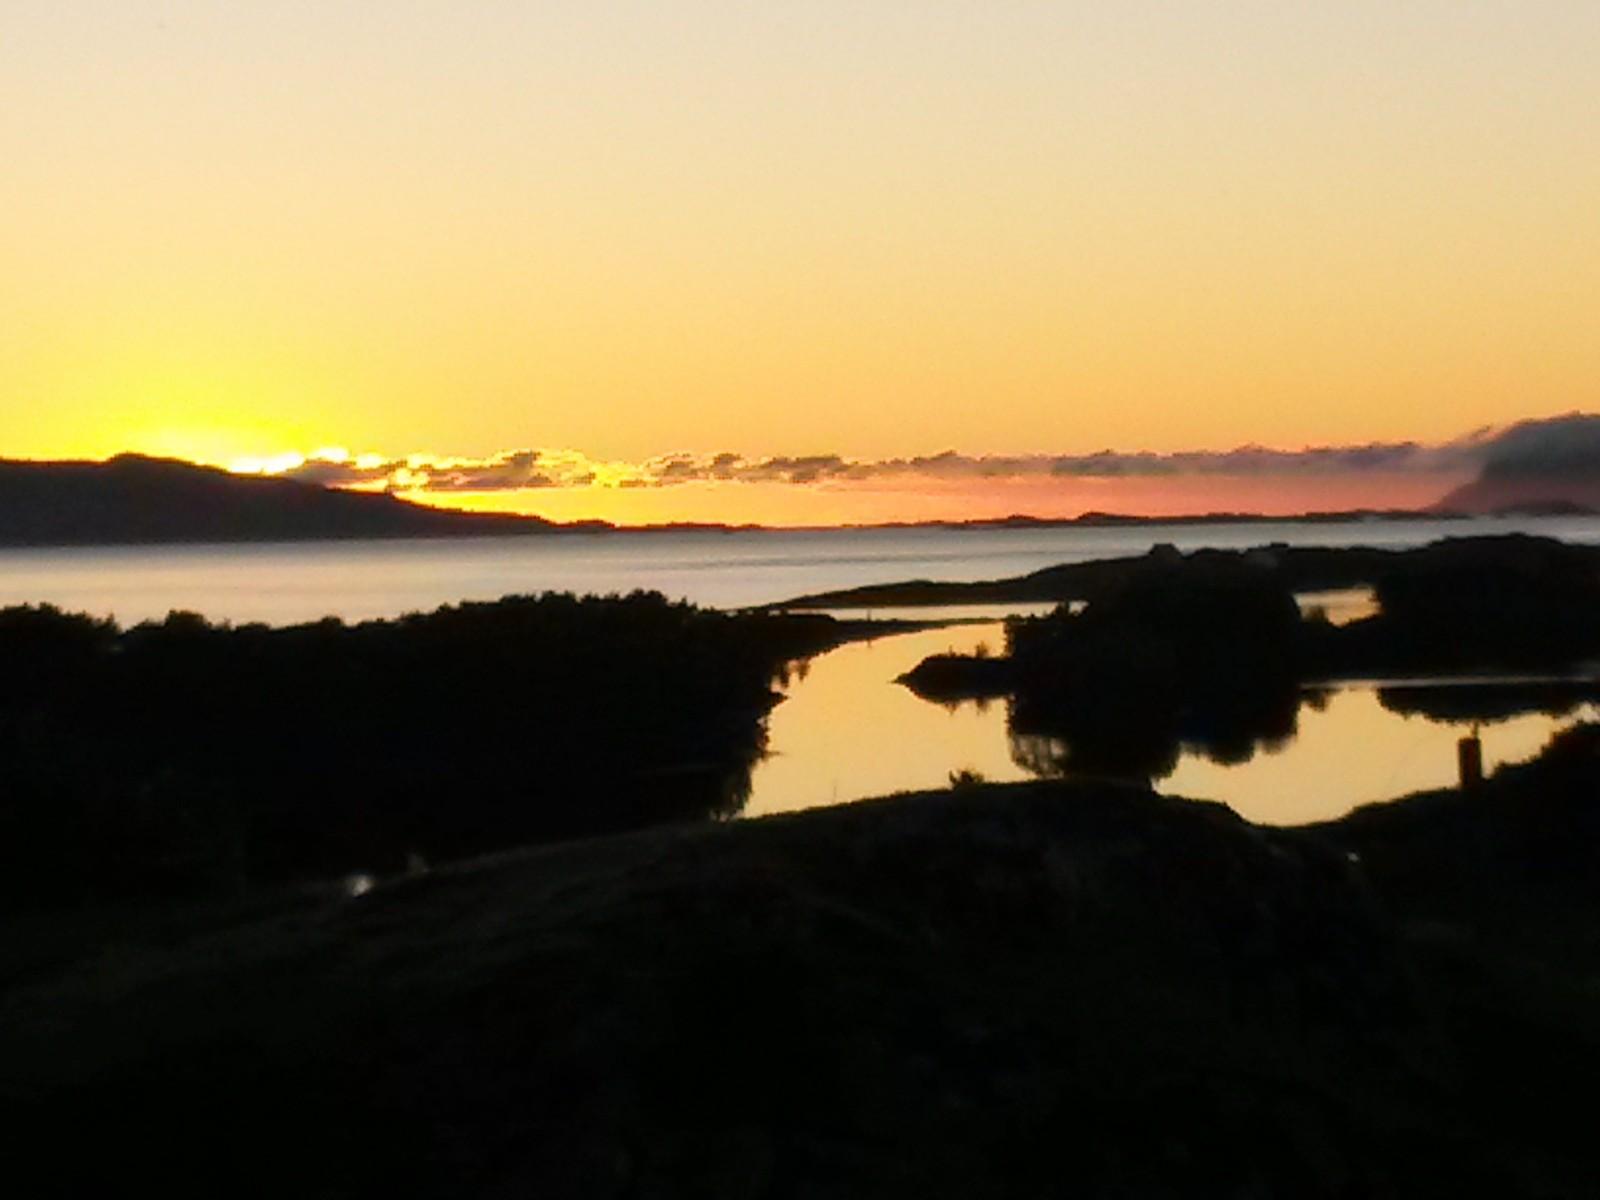 Soldnedgang over Ytre Stavøyvåg og Brufjorden